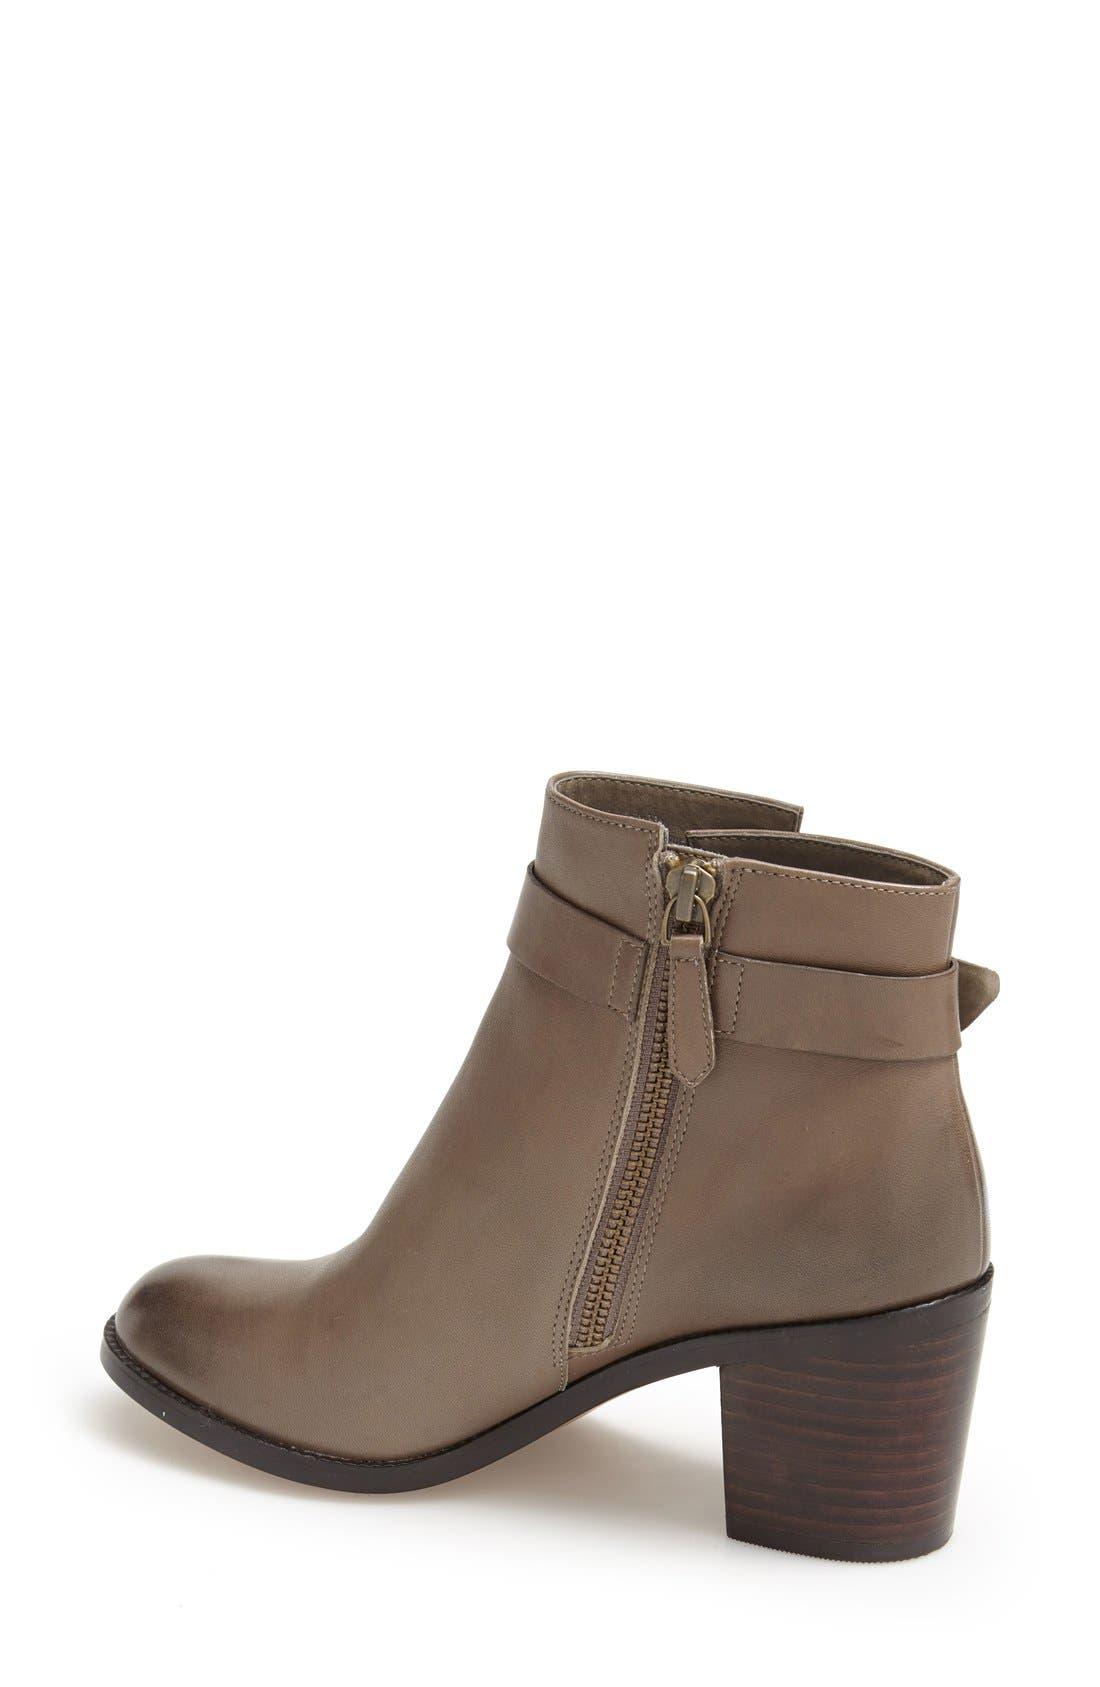 Alternate Image 2  - Halogen® 'Glenna' Leather Ankle Bootie (Women)